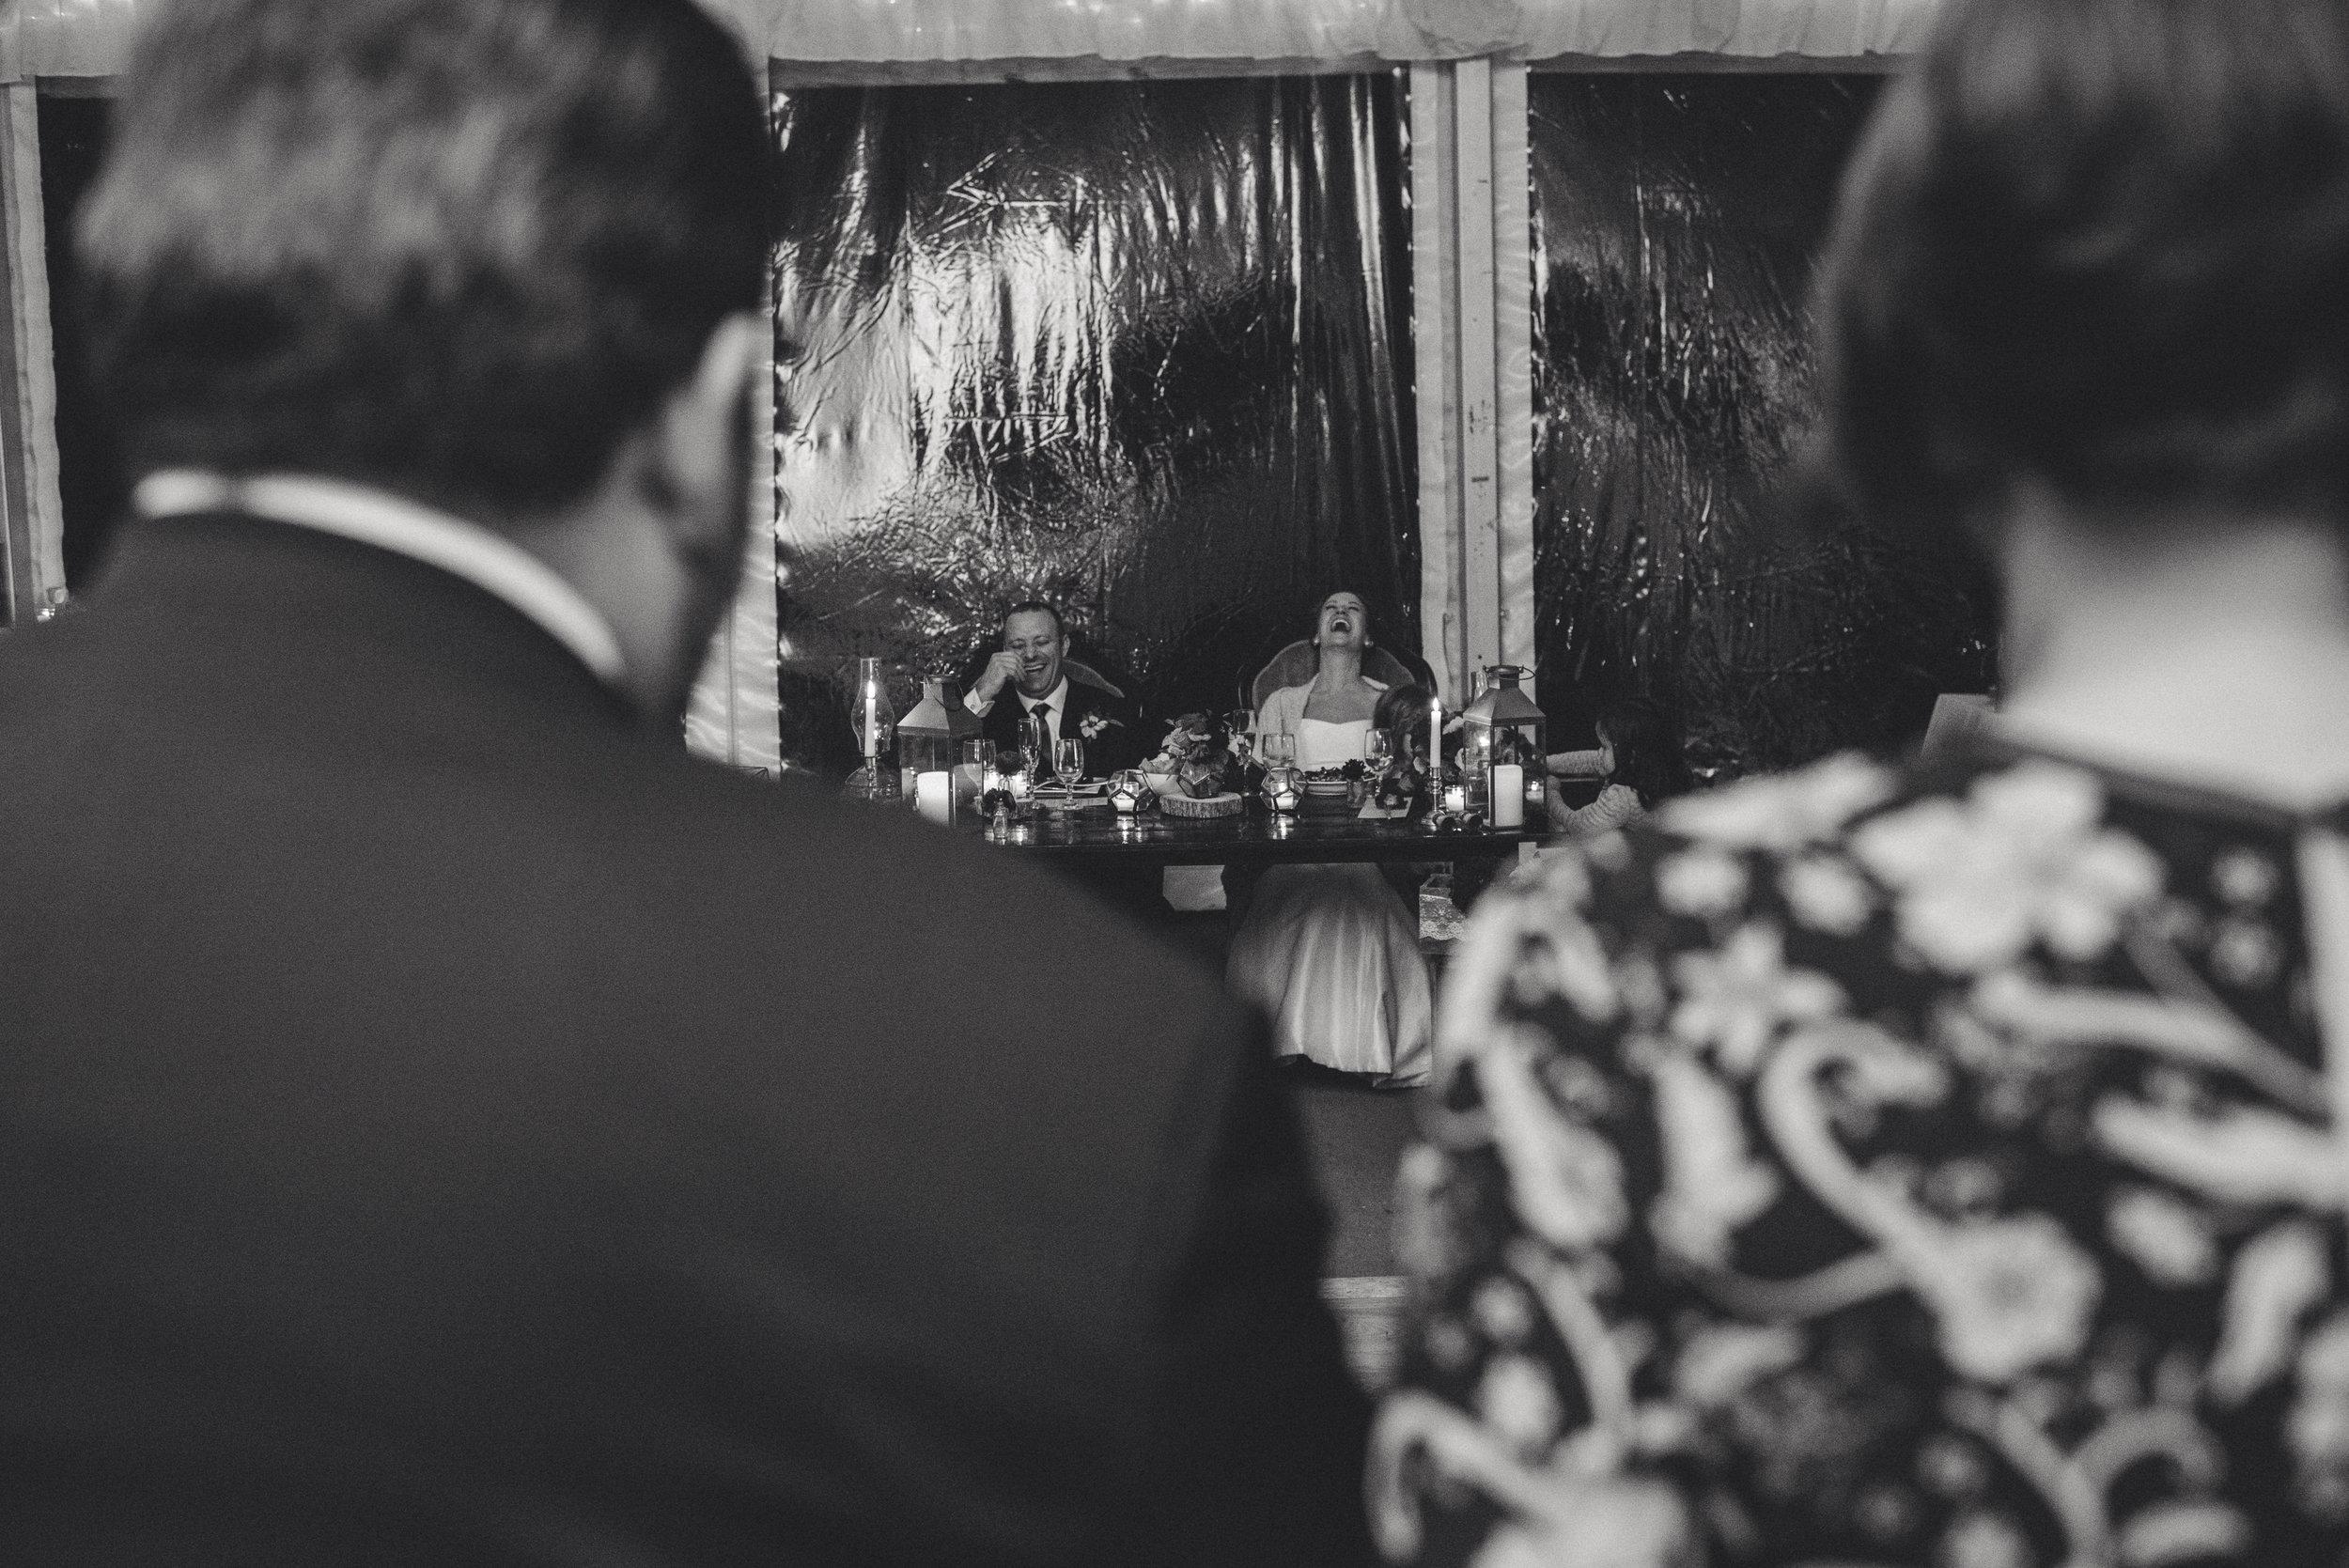 JACQUELINE & ANDREW WARSHAWER -BROOKMILL FARM FALL WEDDING - INTIMATE WEDDING PHOTOGRAPHER - TWOTWENTY by CHI-CHI AGBIM-606.jpg